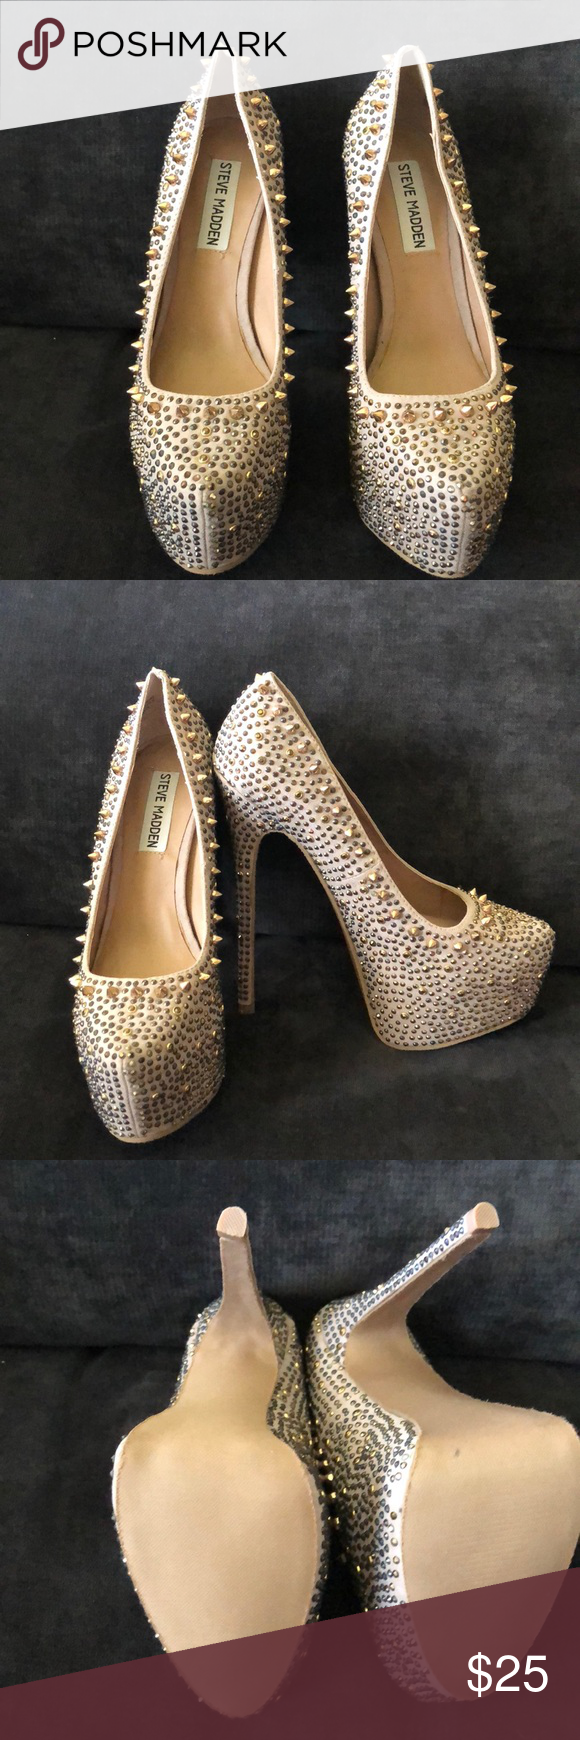 High heels Steve Madden nude 6 inch heel with a 2 inch platform. Never been  worn. Steve Madden Shoes Heels